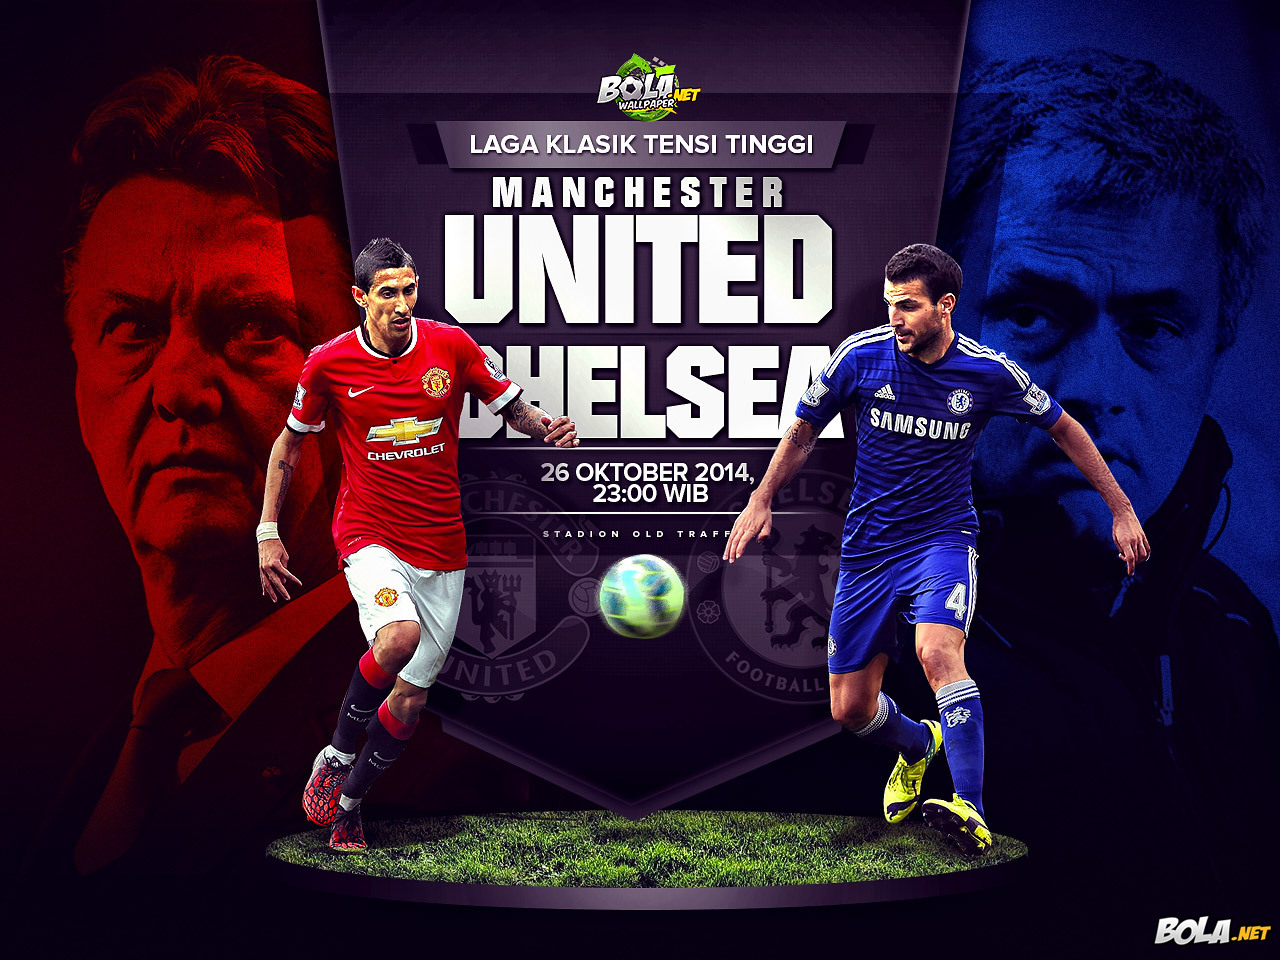 Download Wallpaper   Manchester United vs Chelsea   Bolanet 1280x960